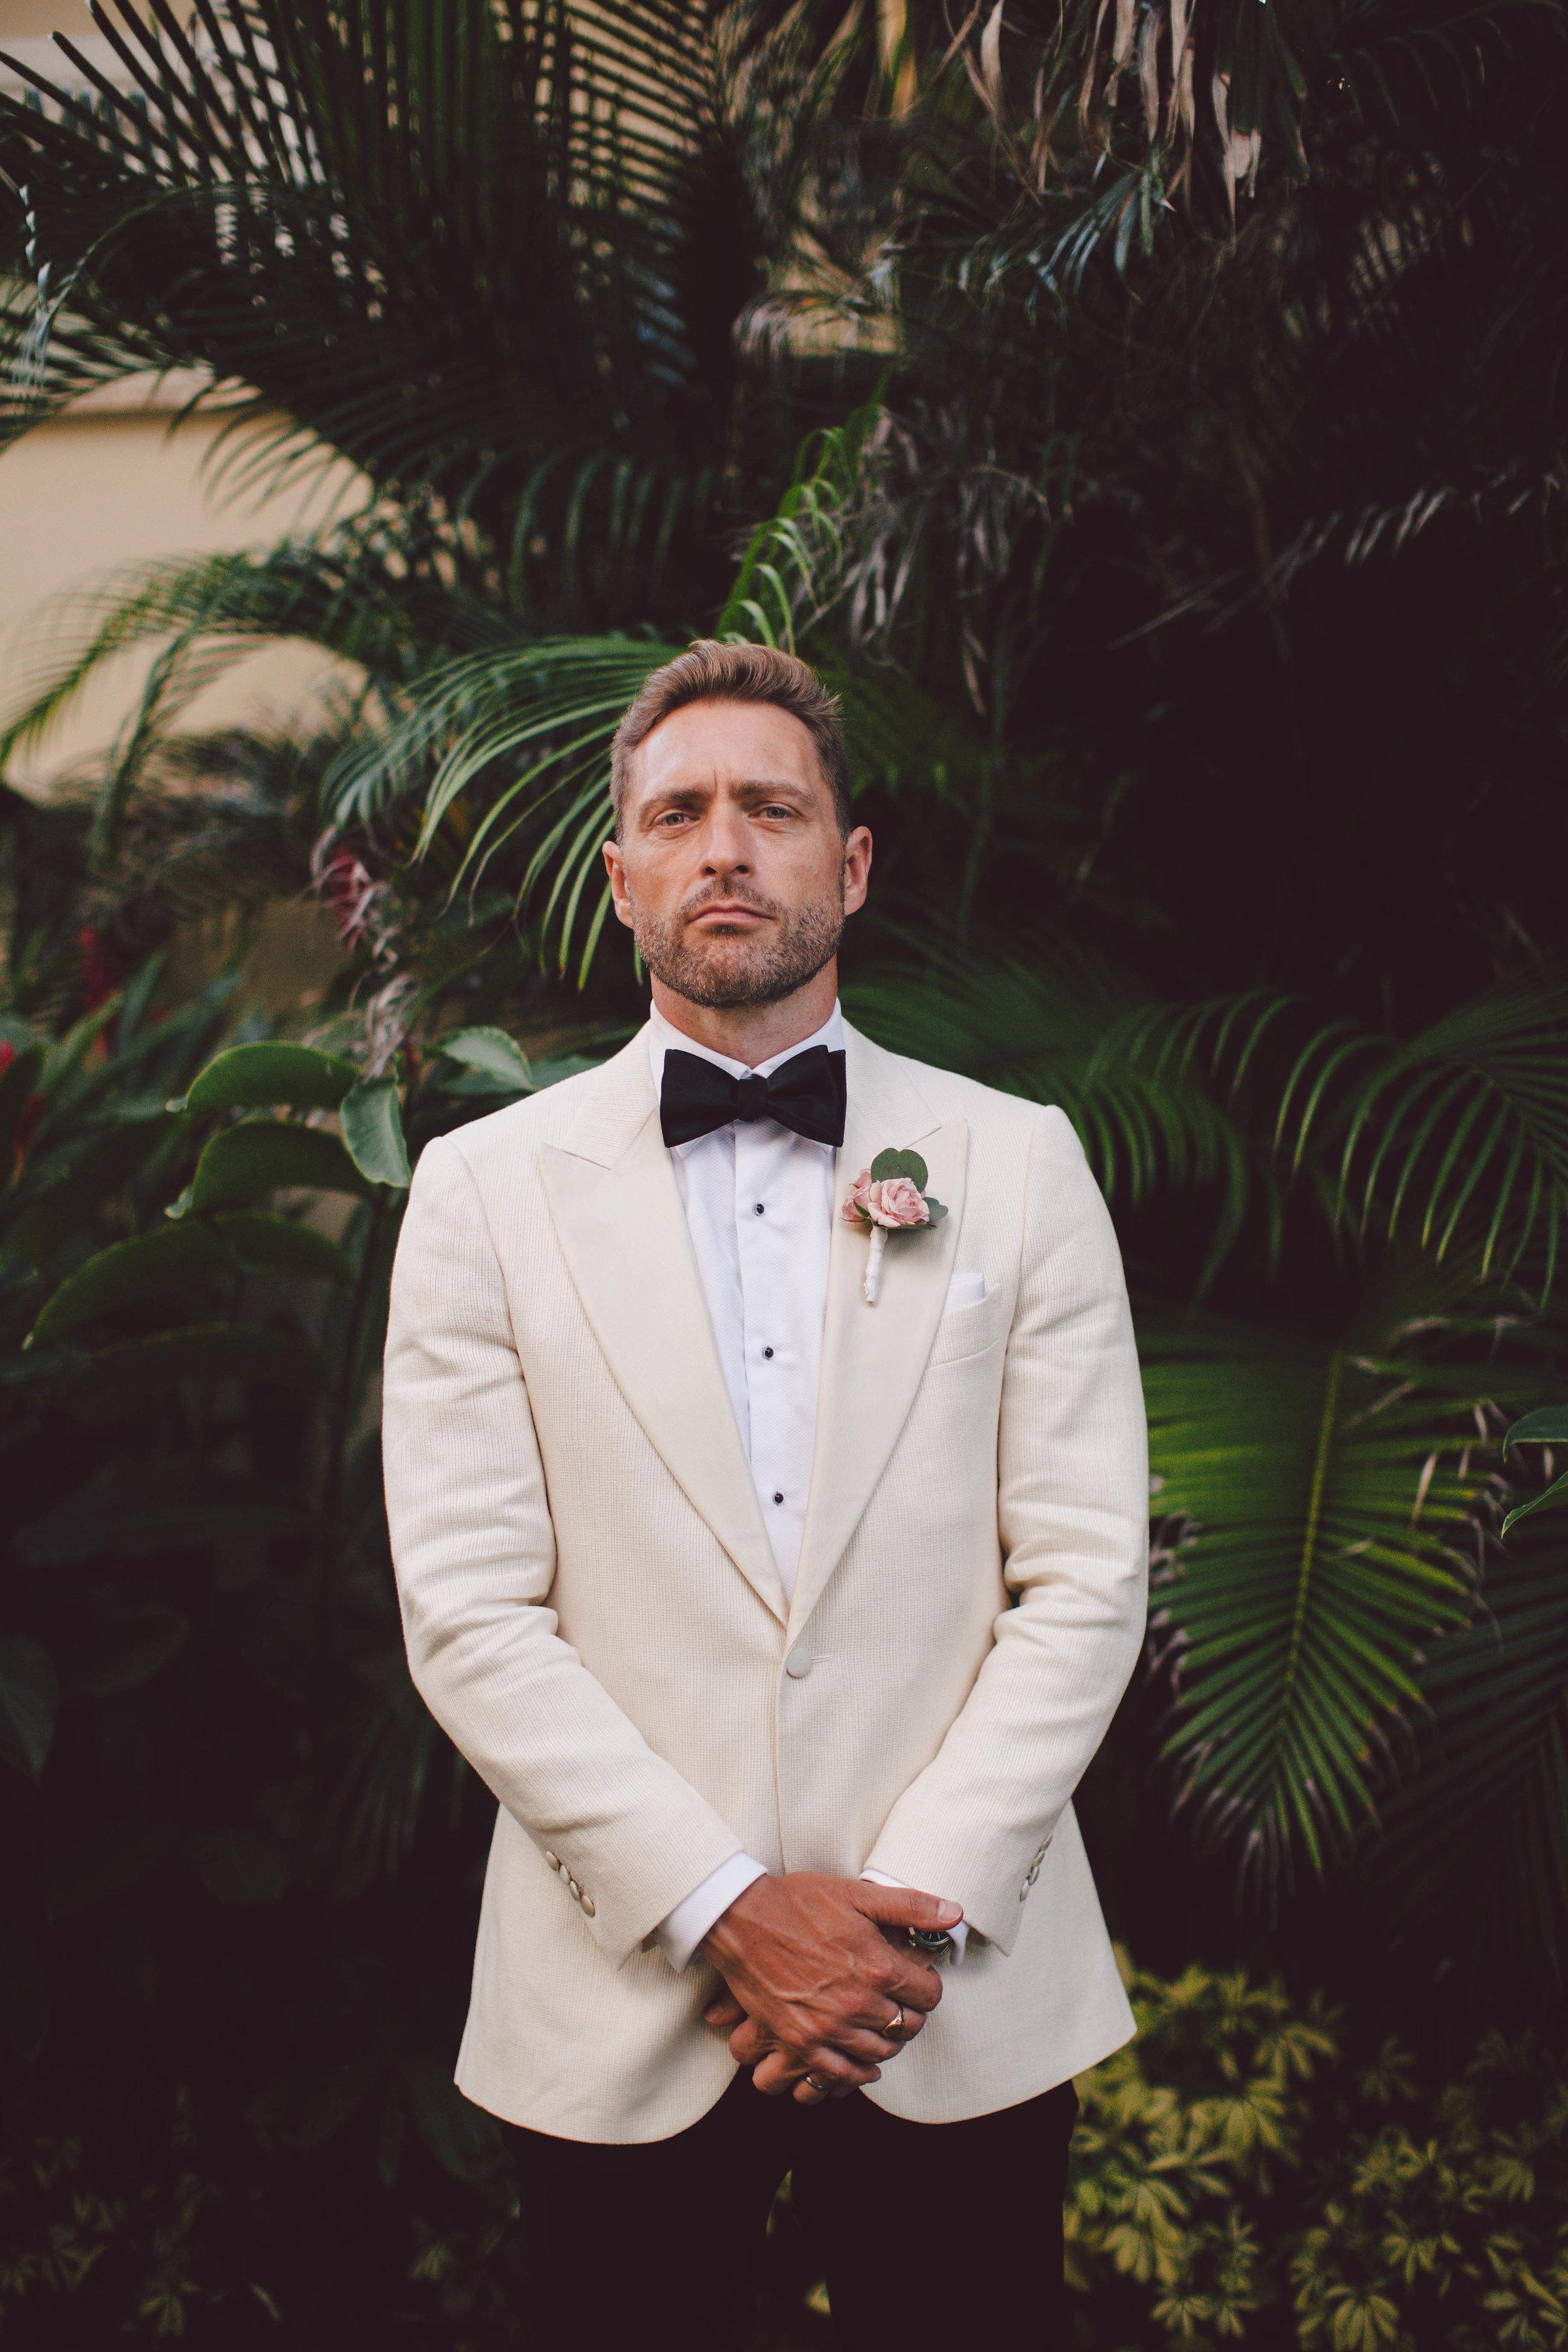 mexico_wedding_cancun_villa_la_joya_evangeline_lane_106.jpg